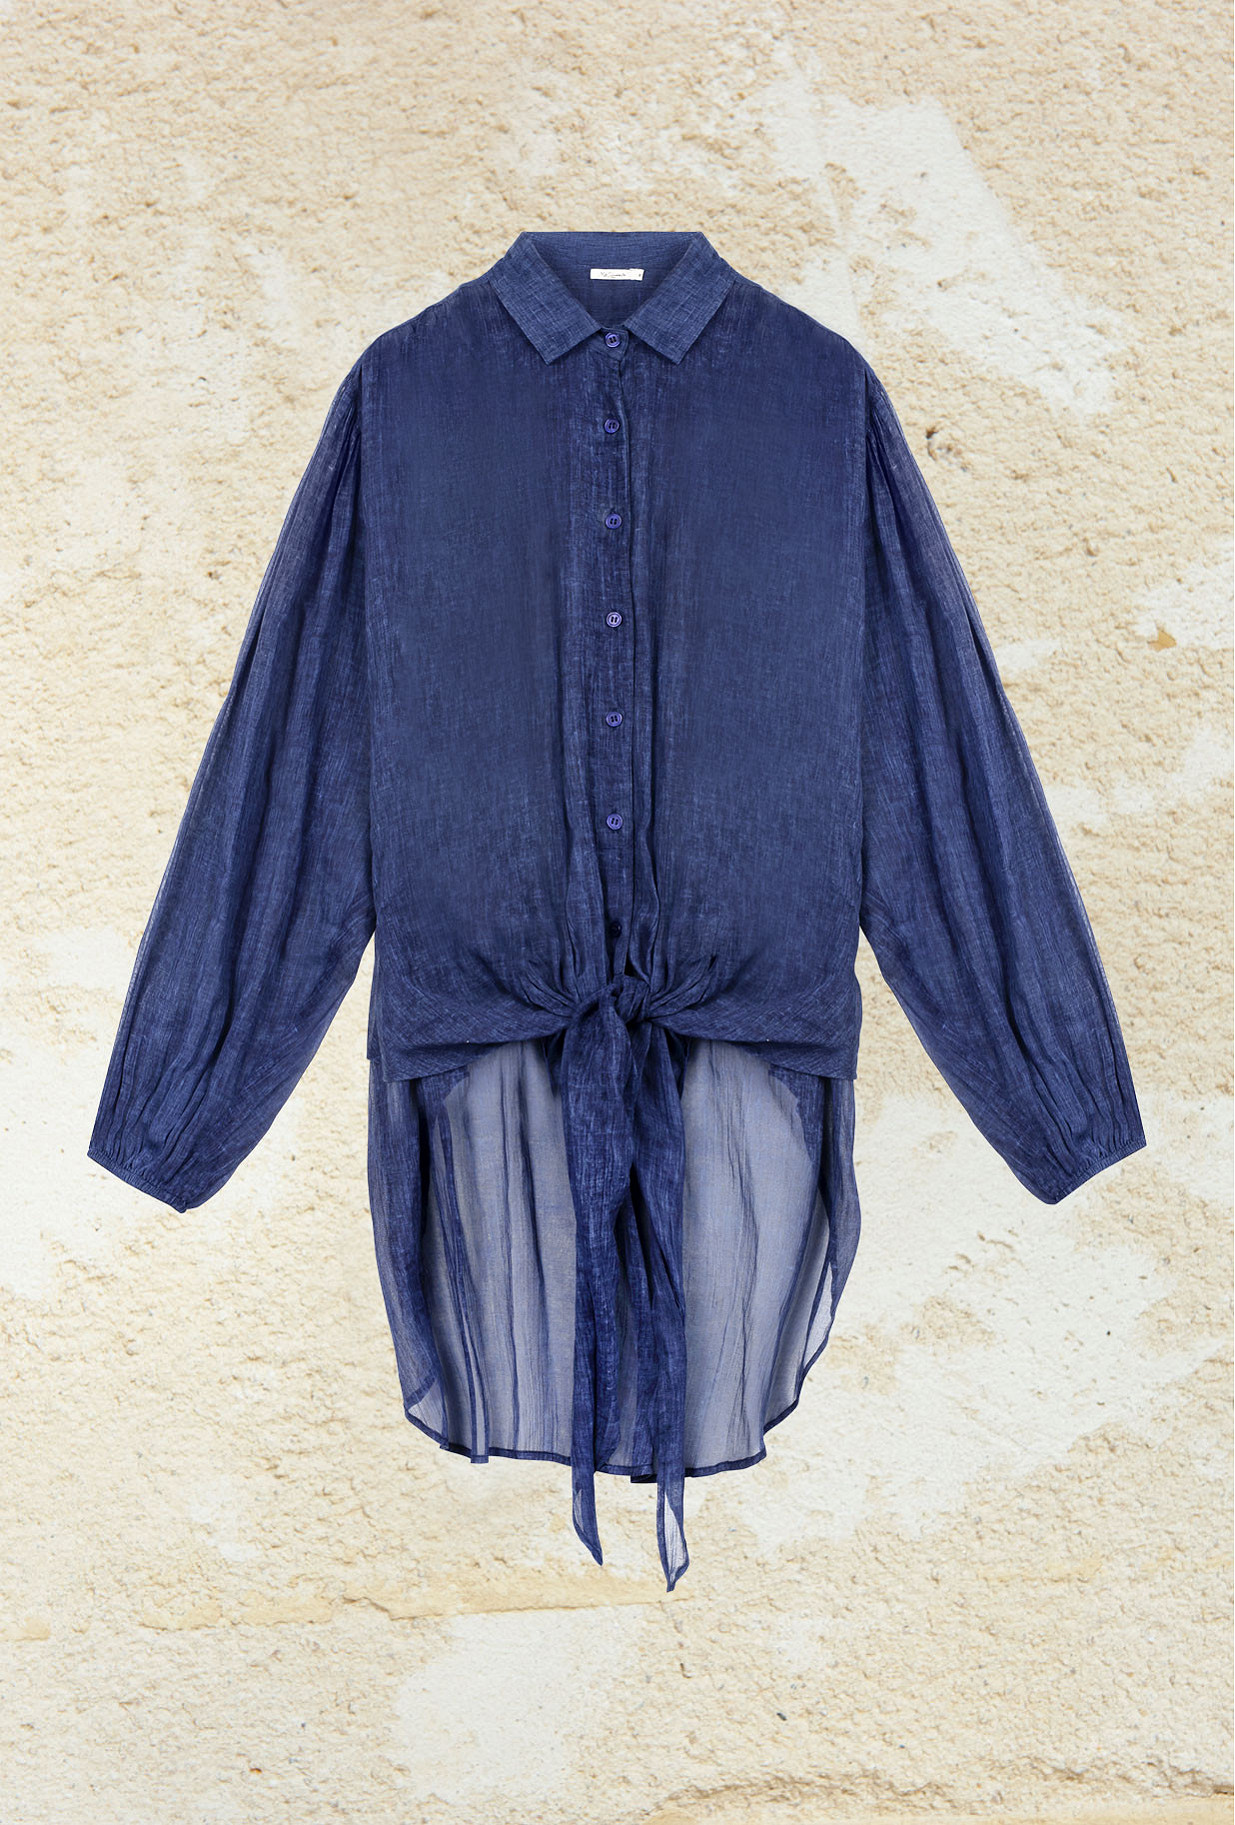 Indigo Shirt Chipper Mes Demoiselles Paris